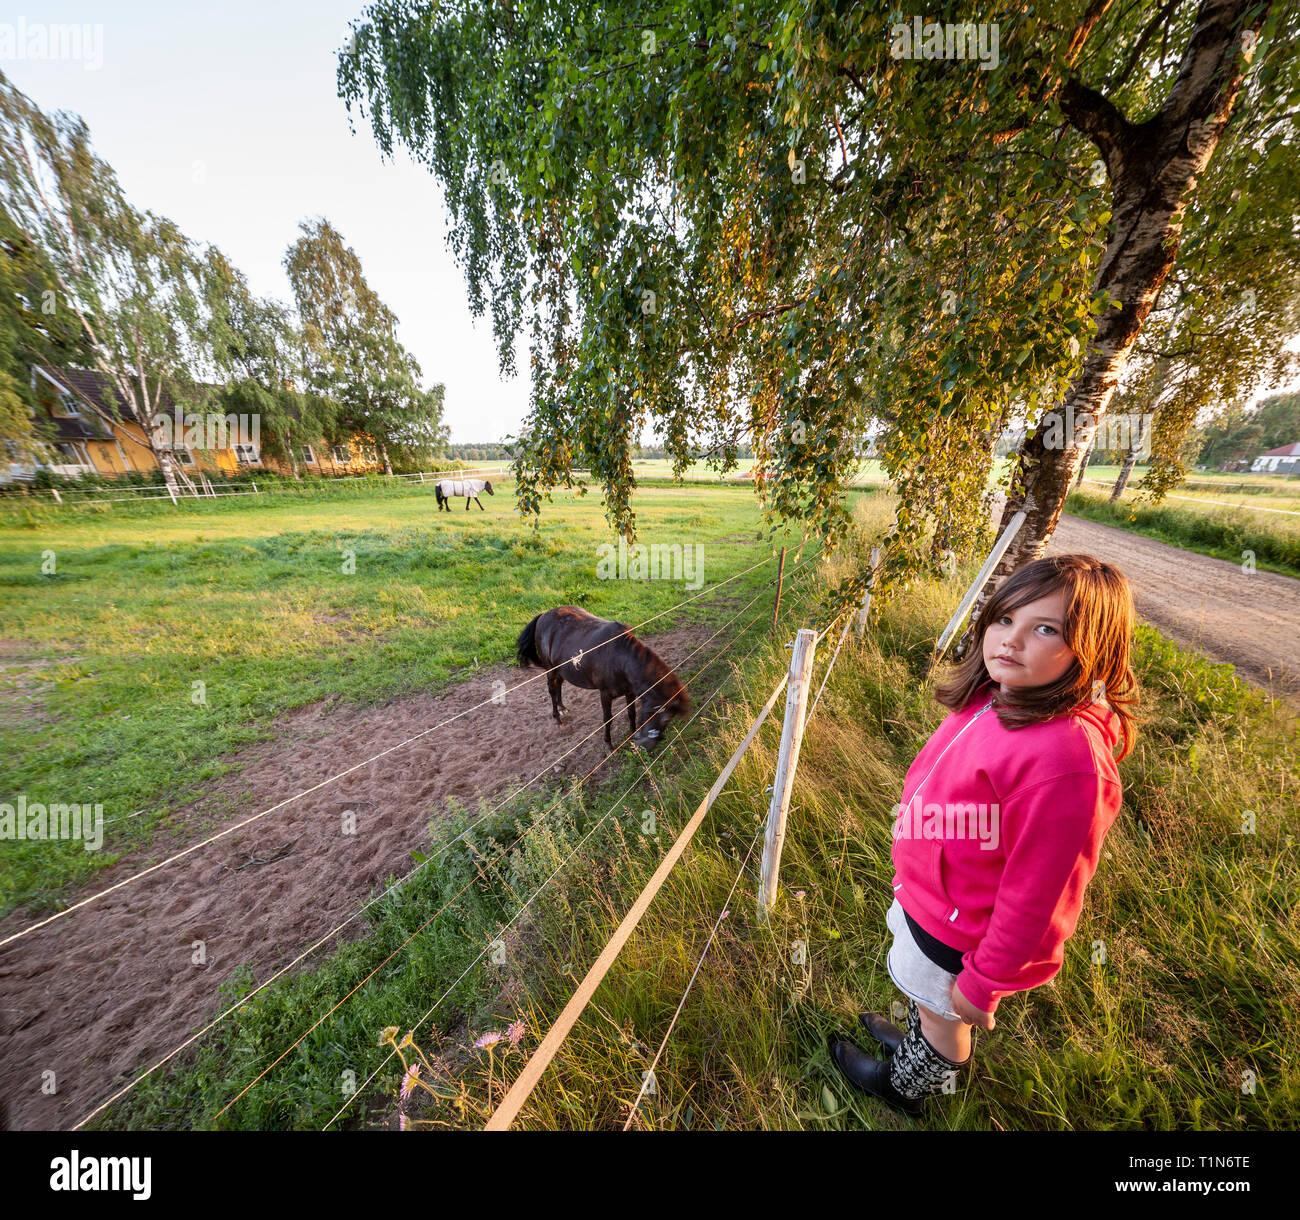 Girl and a horse. Dalarna / Dalecarlia, Sweden, Scandinavia. Stock Photo